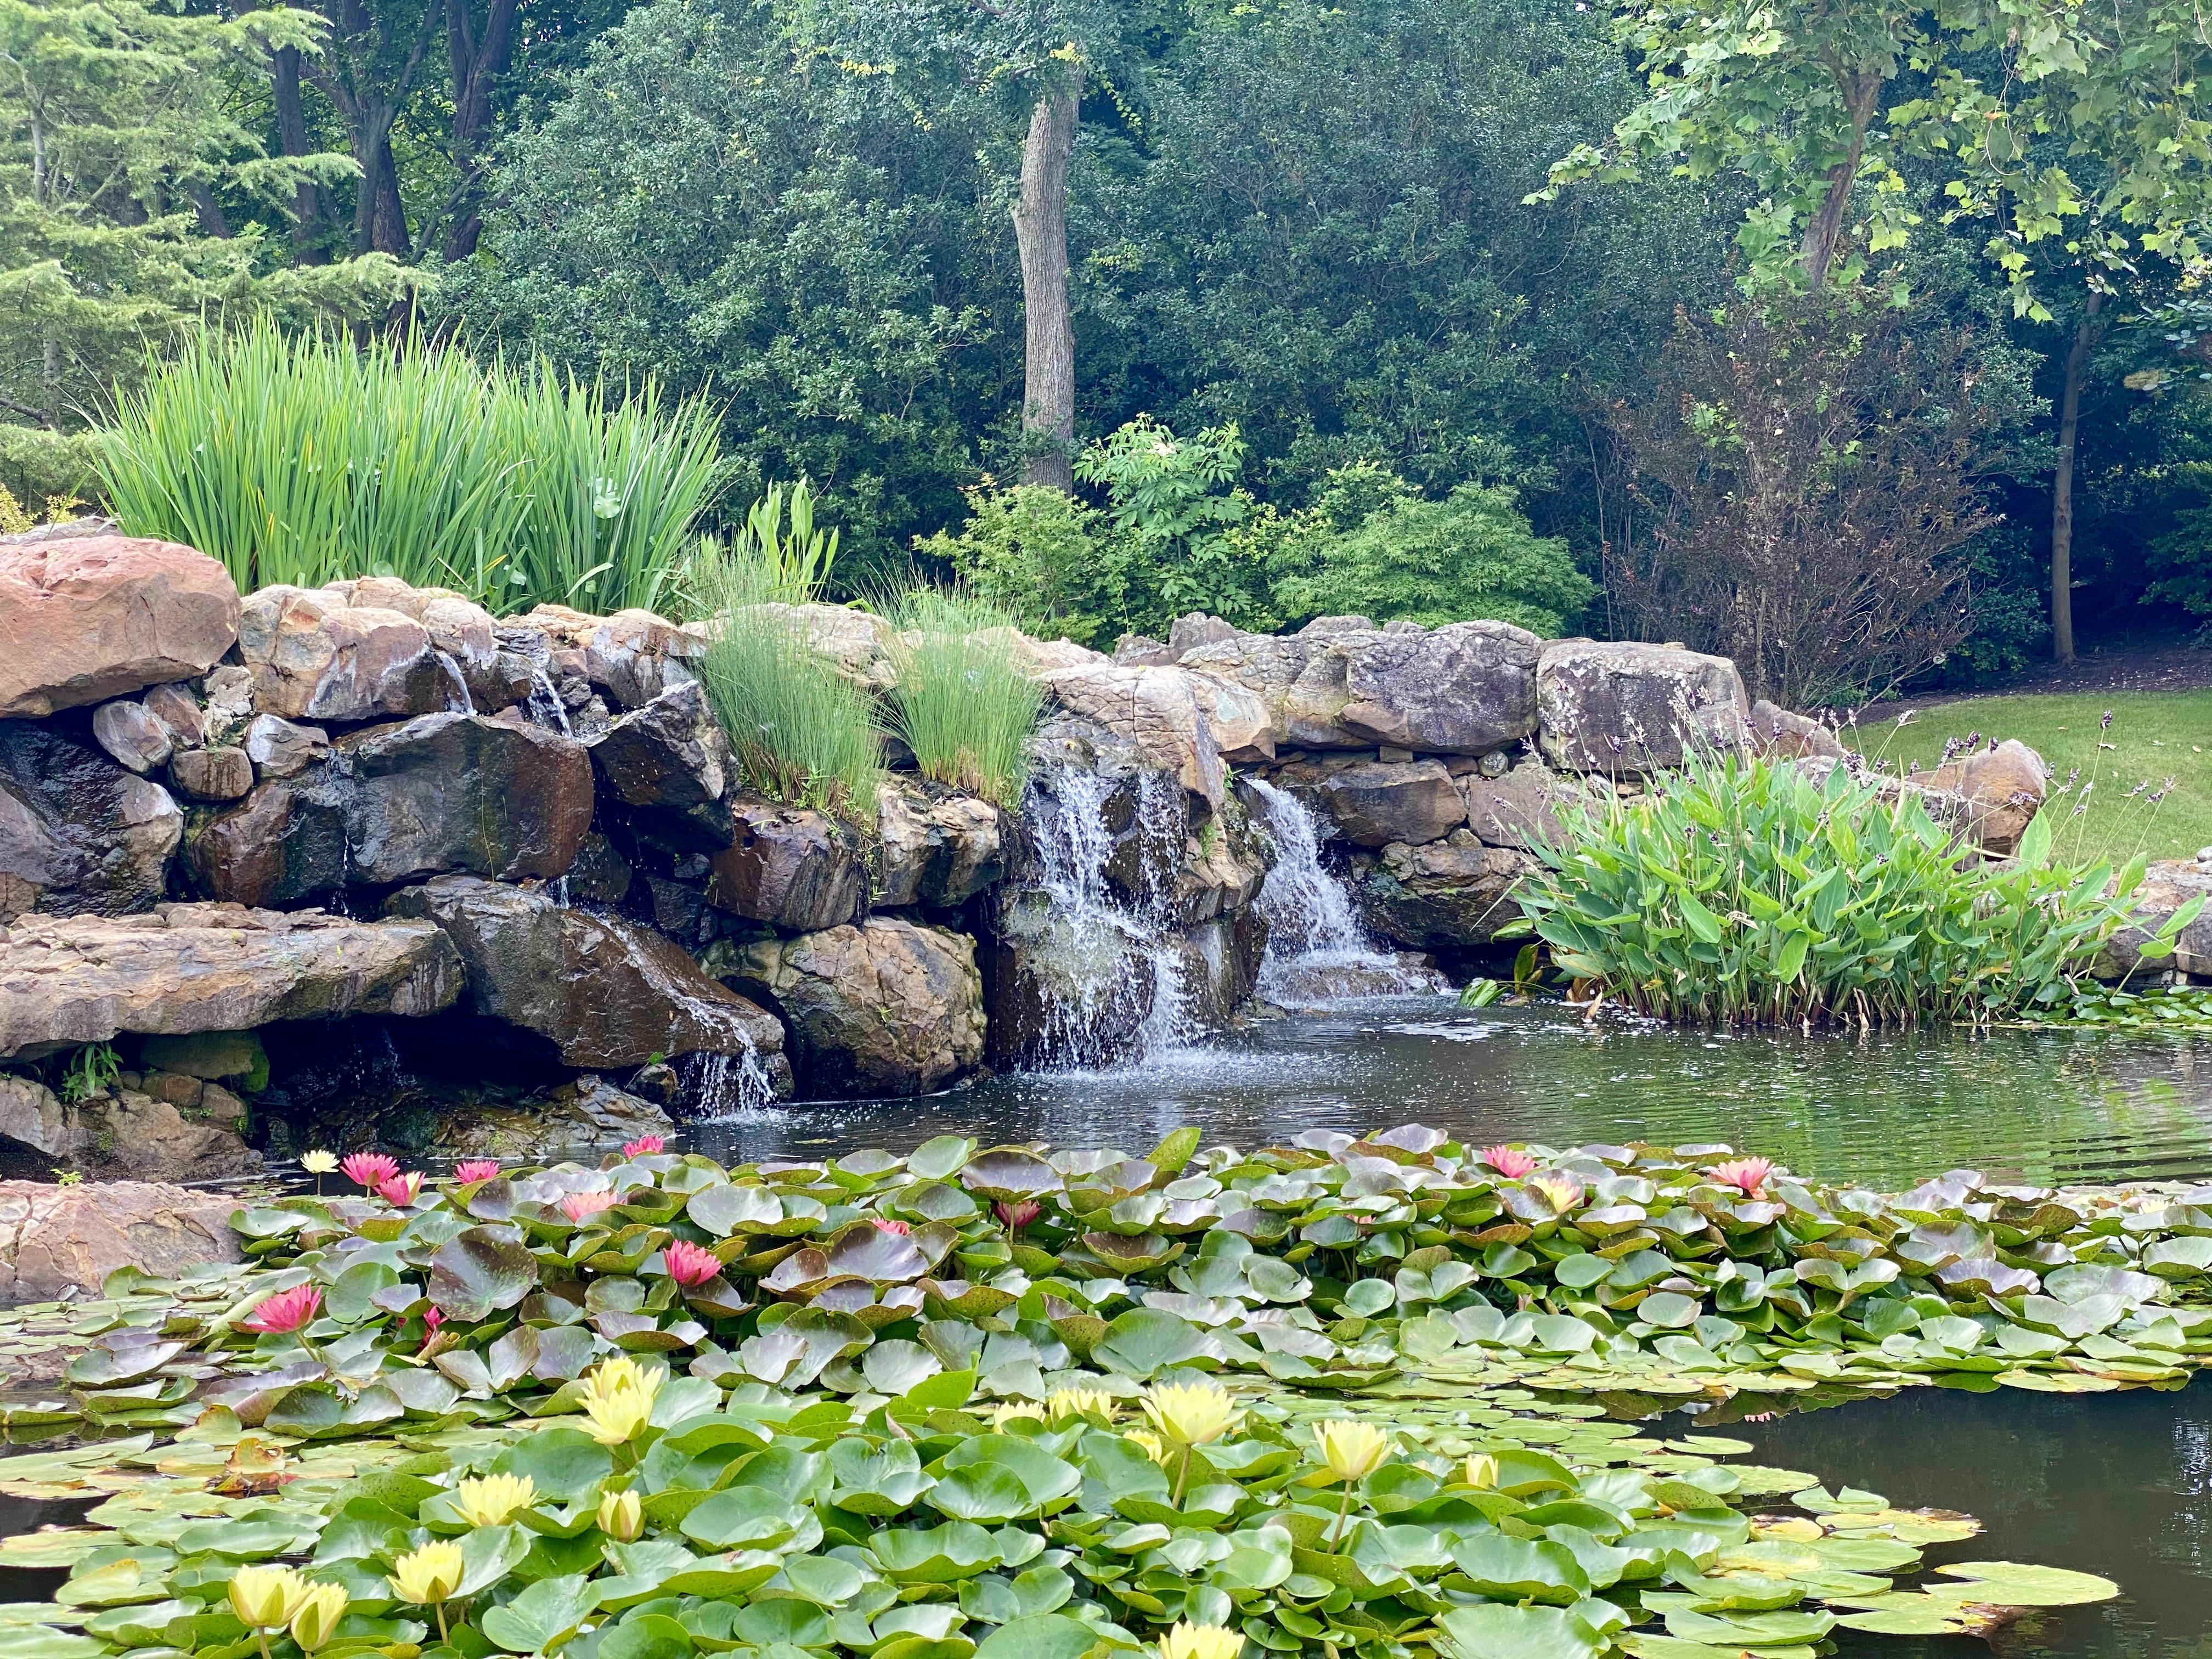 Lily Pond at the Dallas Arboretum